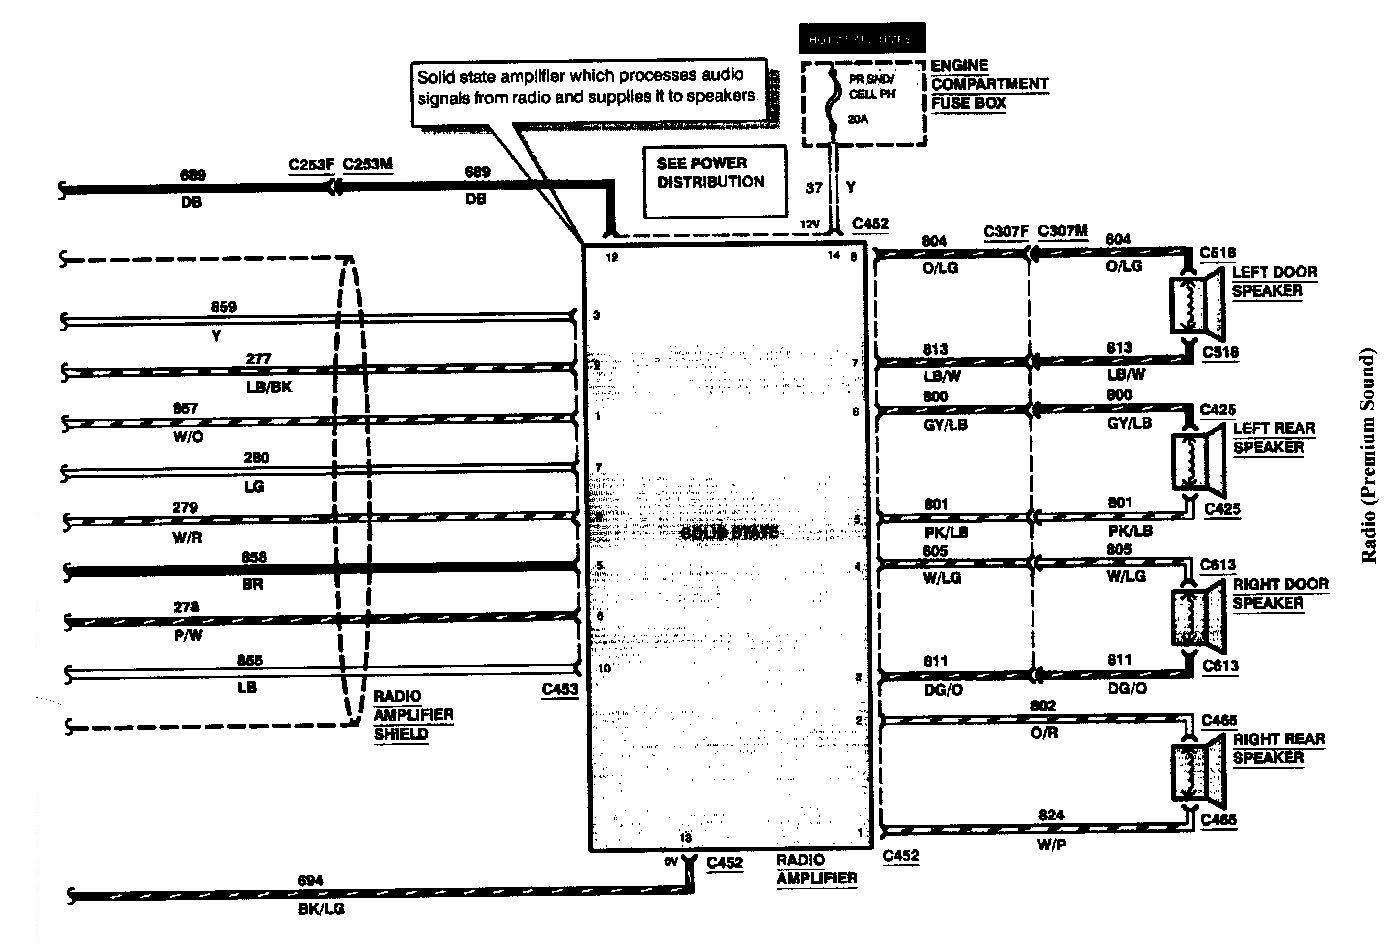 1979 lincoln continental mark v fuse box diagram lincoln 95 saturn stereo wiring diagram #3